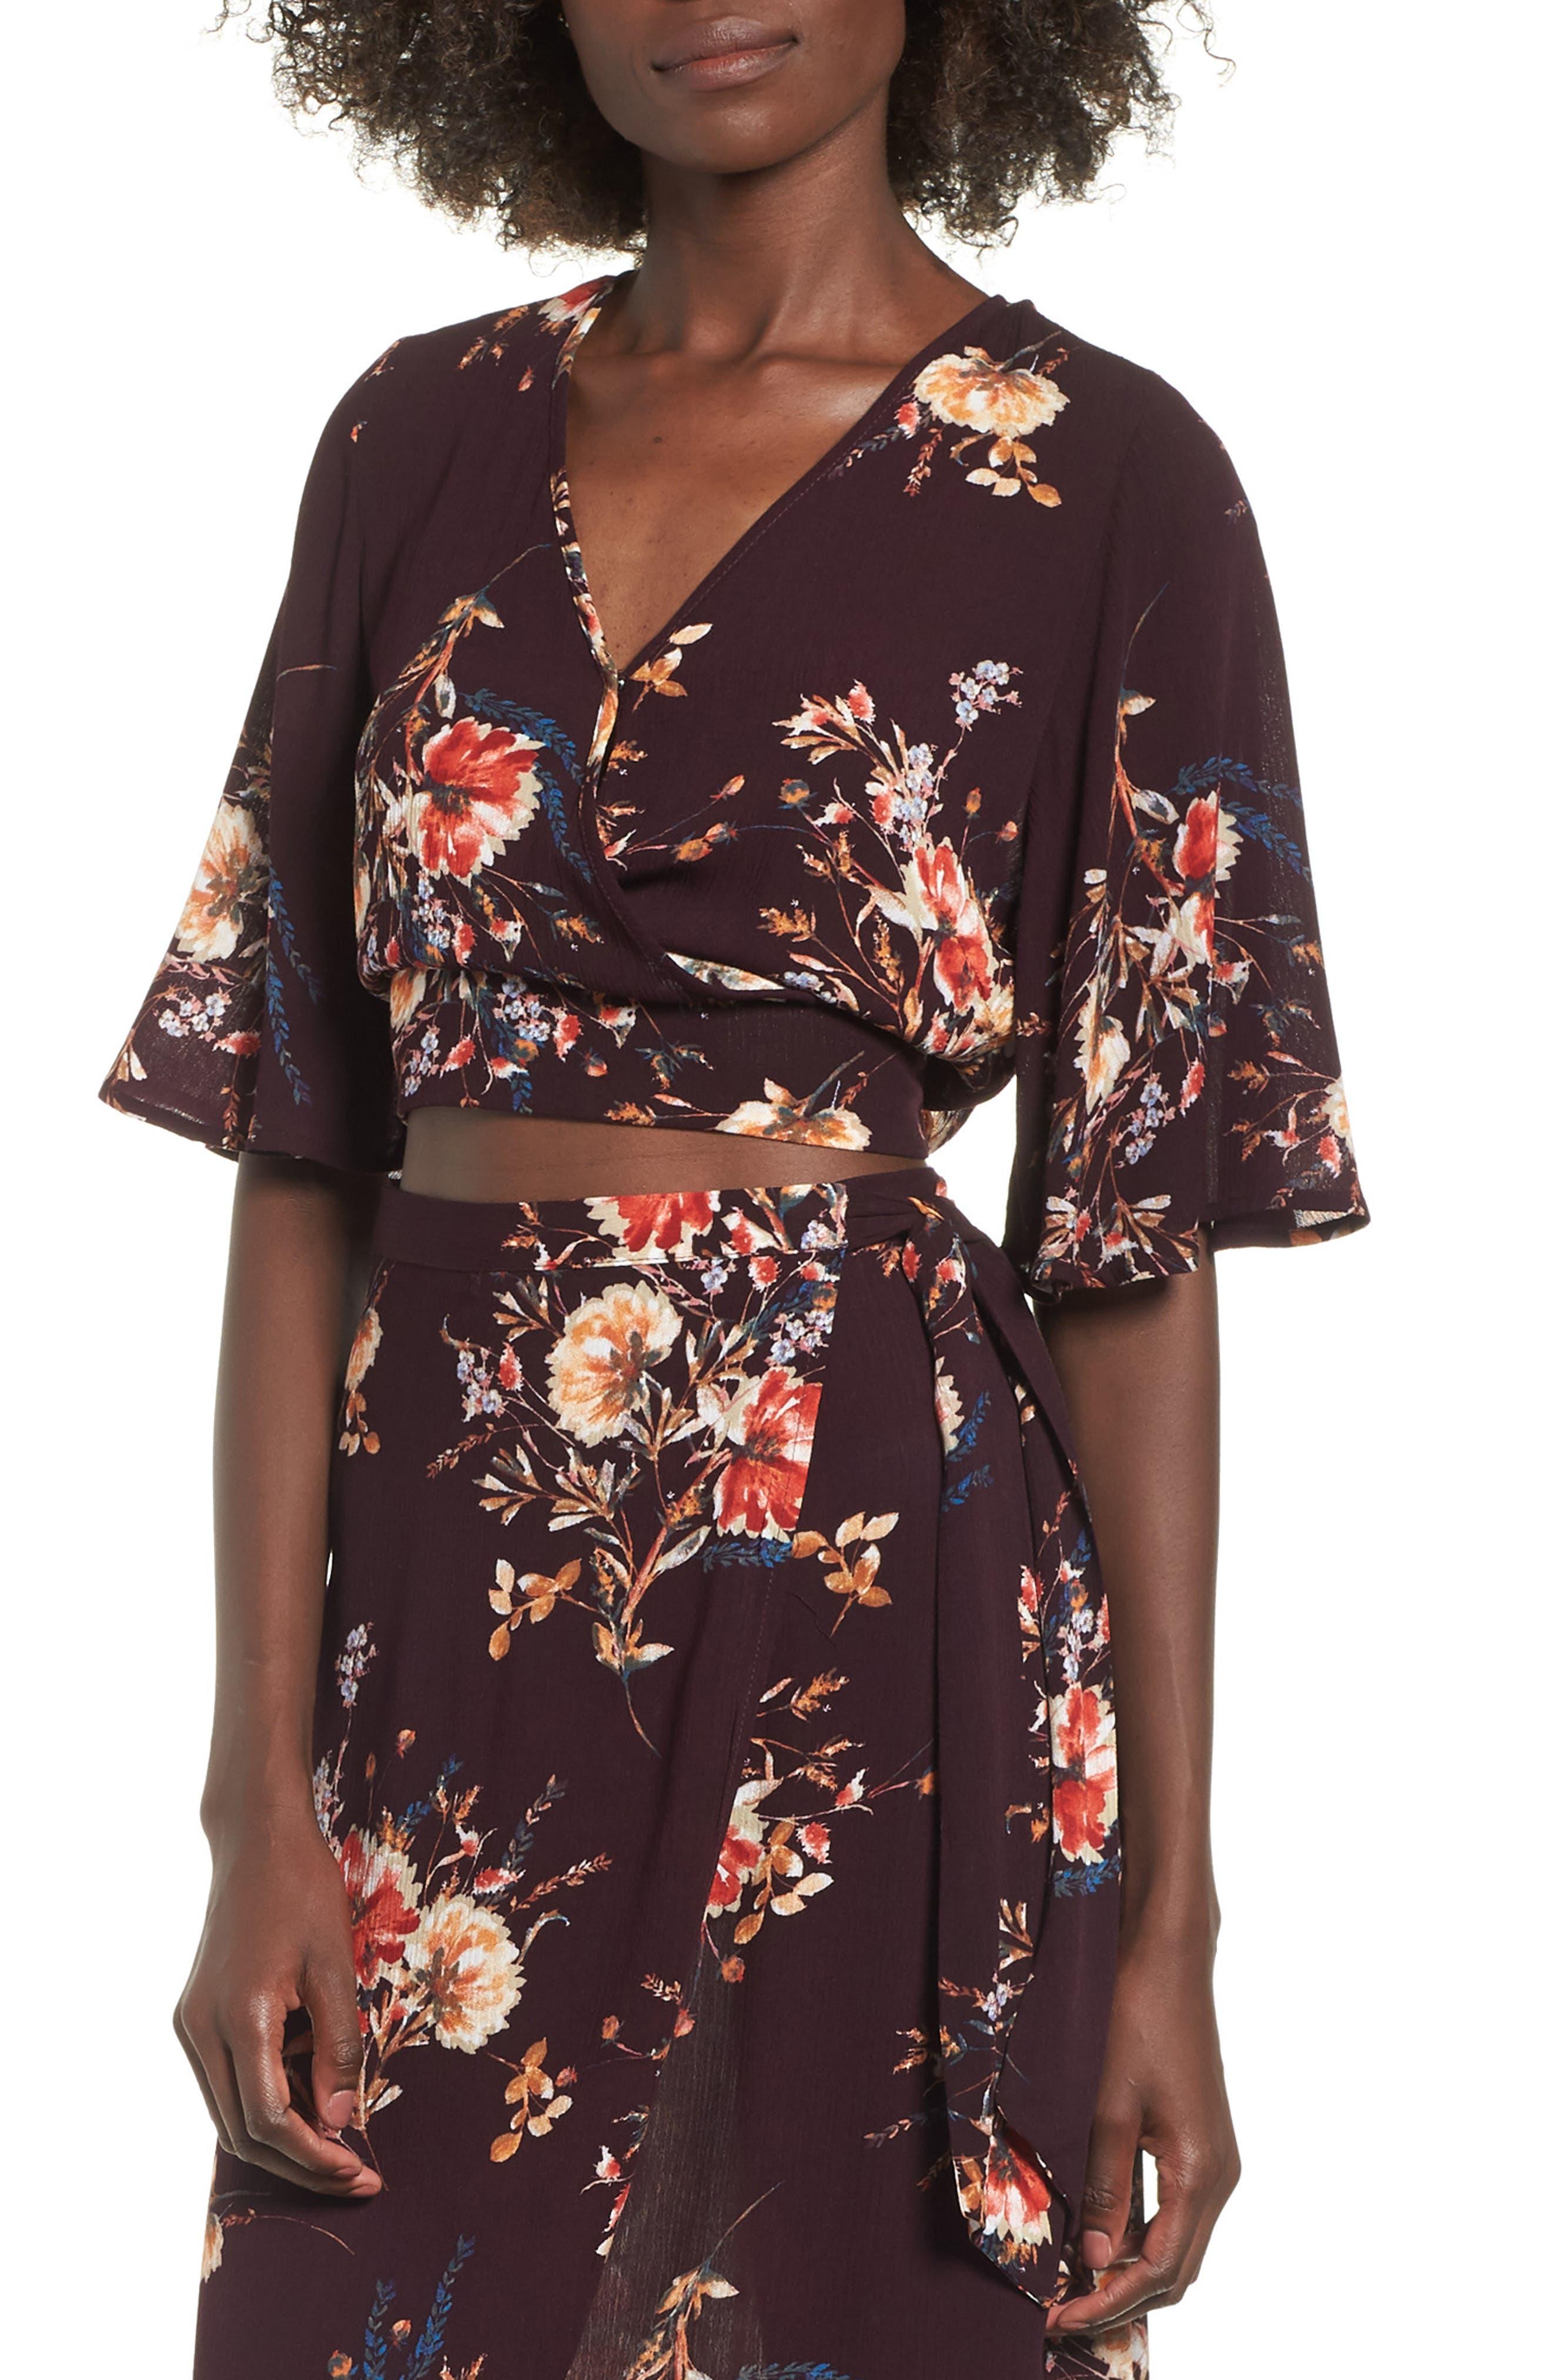 Shadow Floral Tie Back Crop Top,                         Main,                         color, BURGUNDY/ PEACH